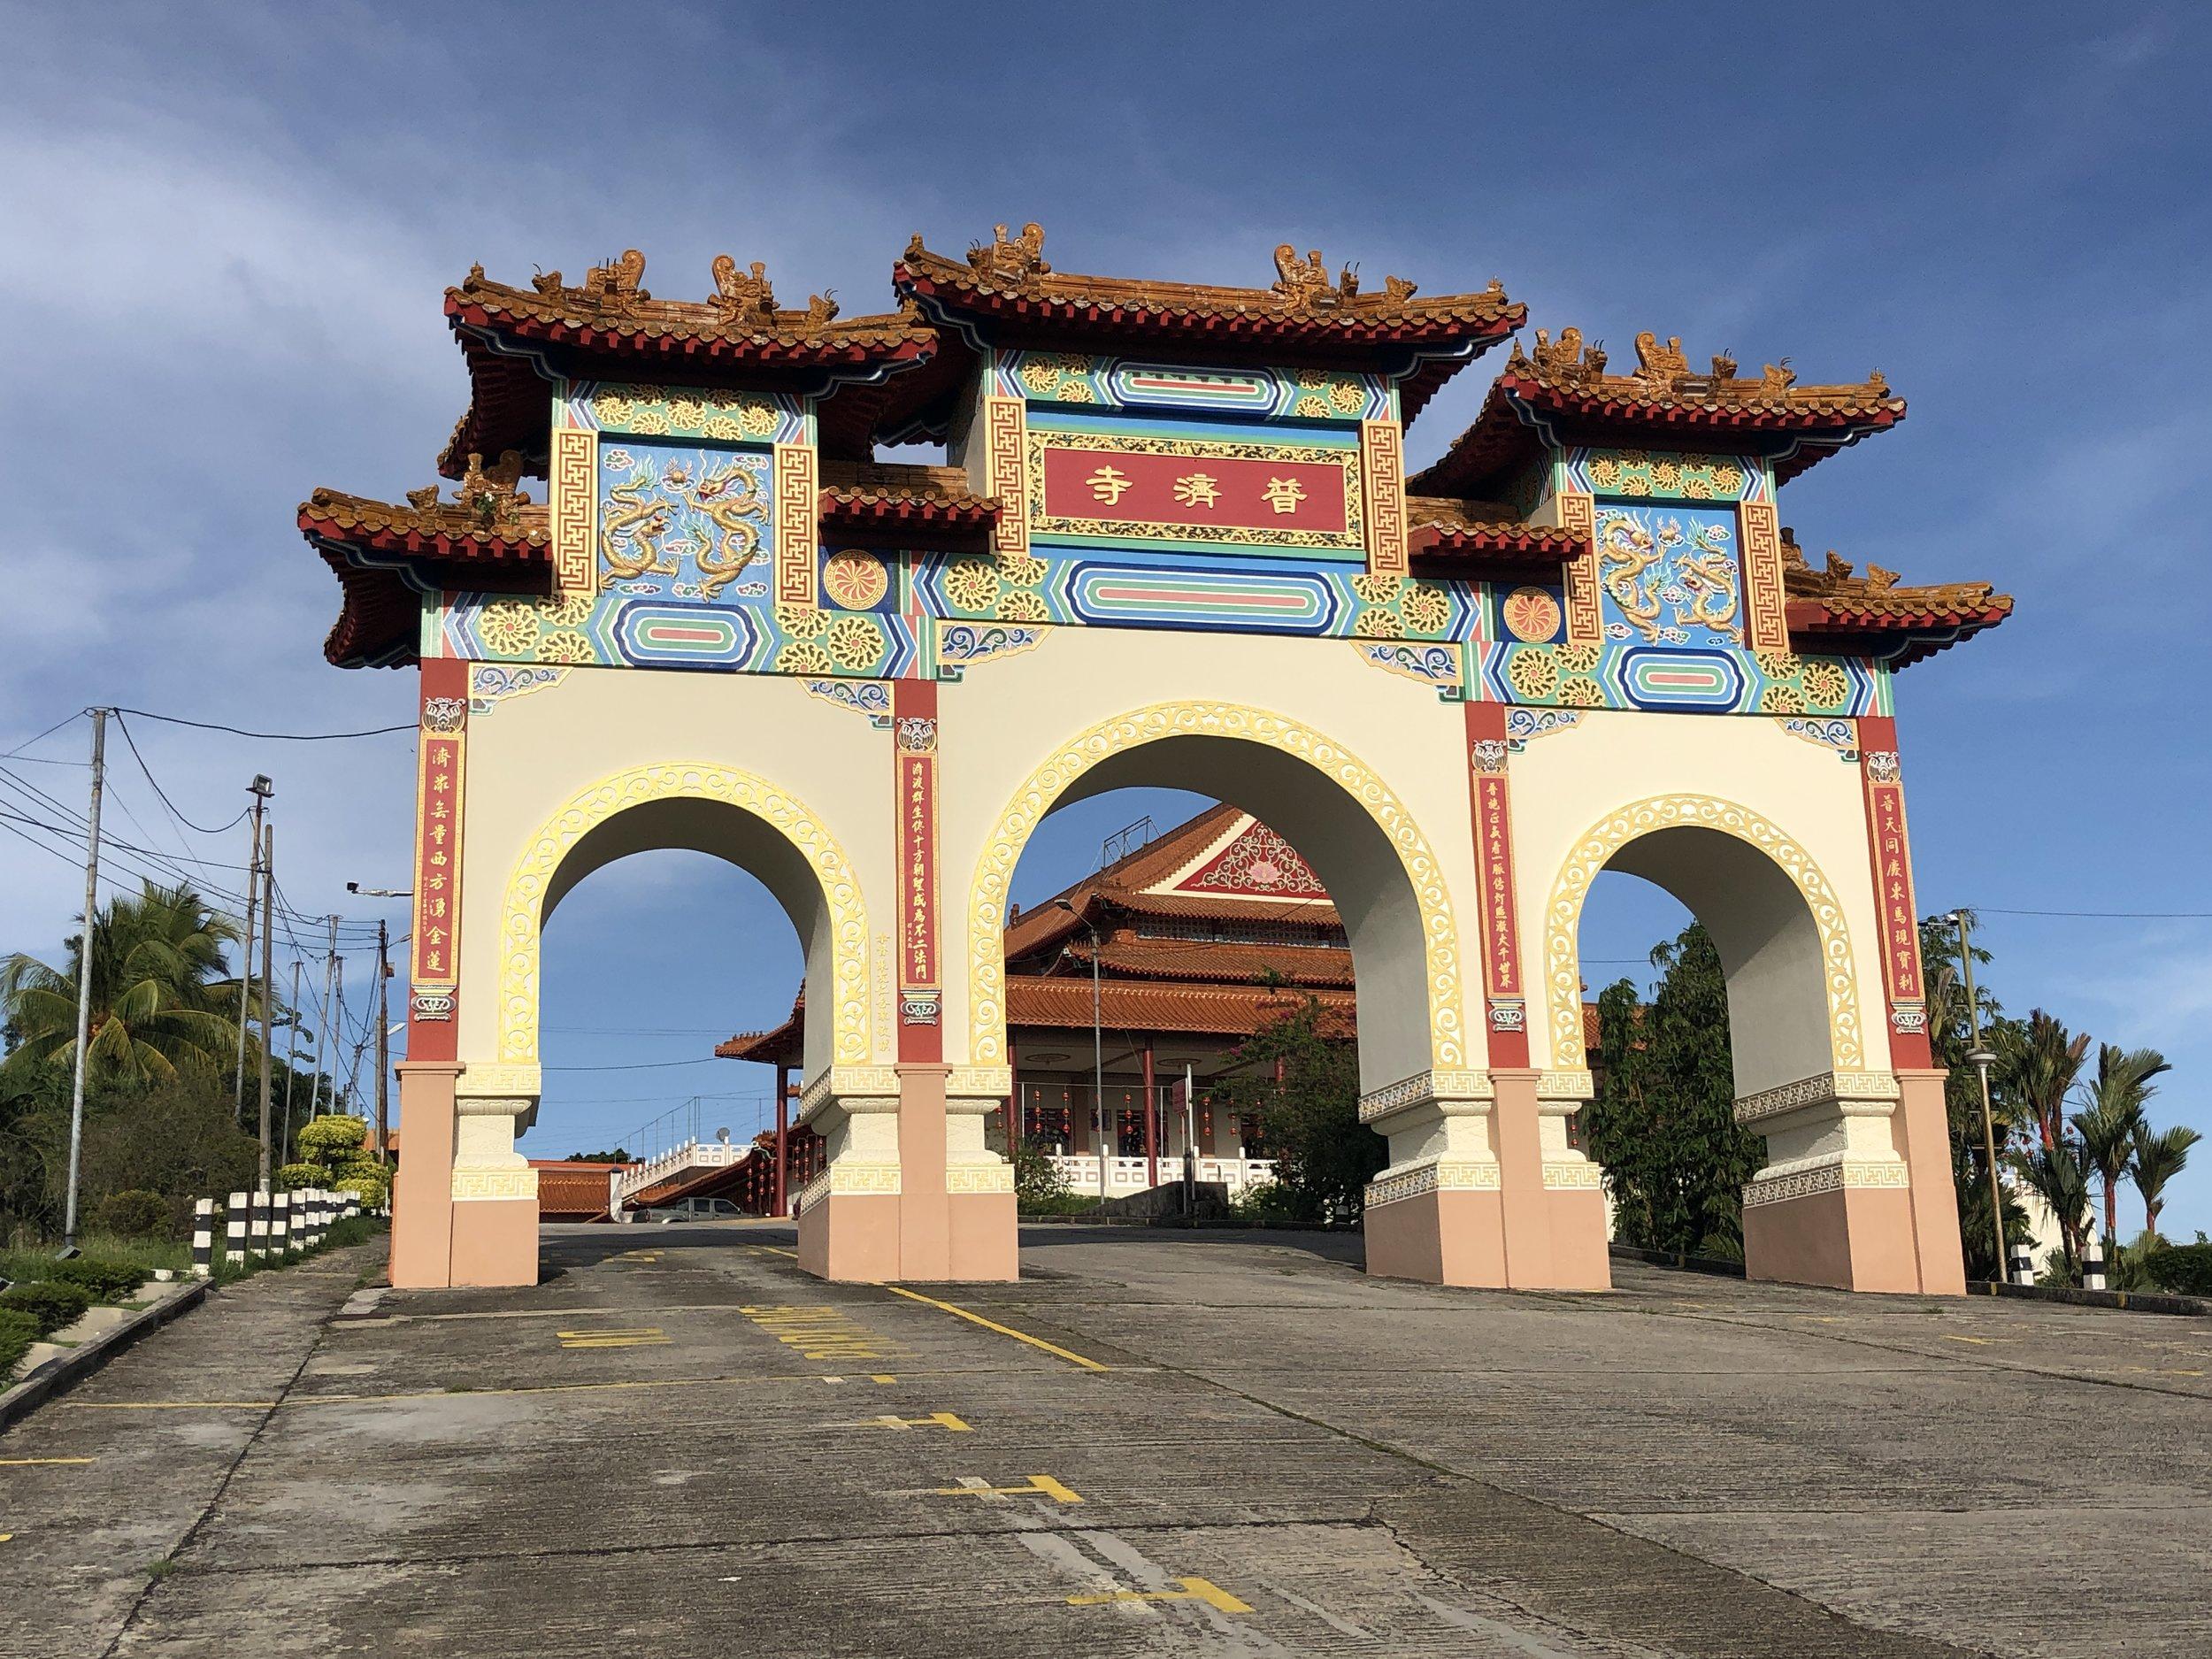 The impressive entrance to Puu Jih Shih Buddhist Temple in Sandakan